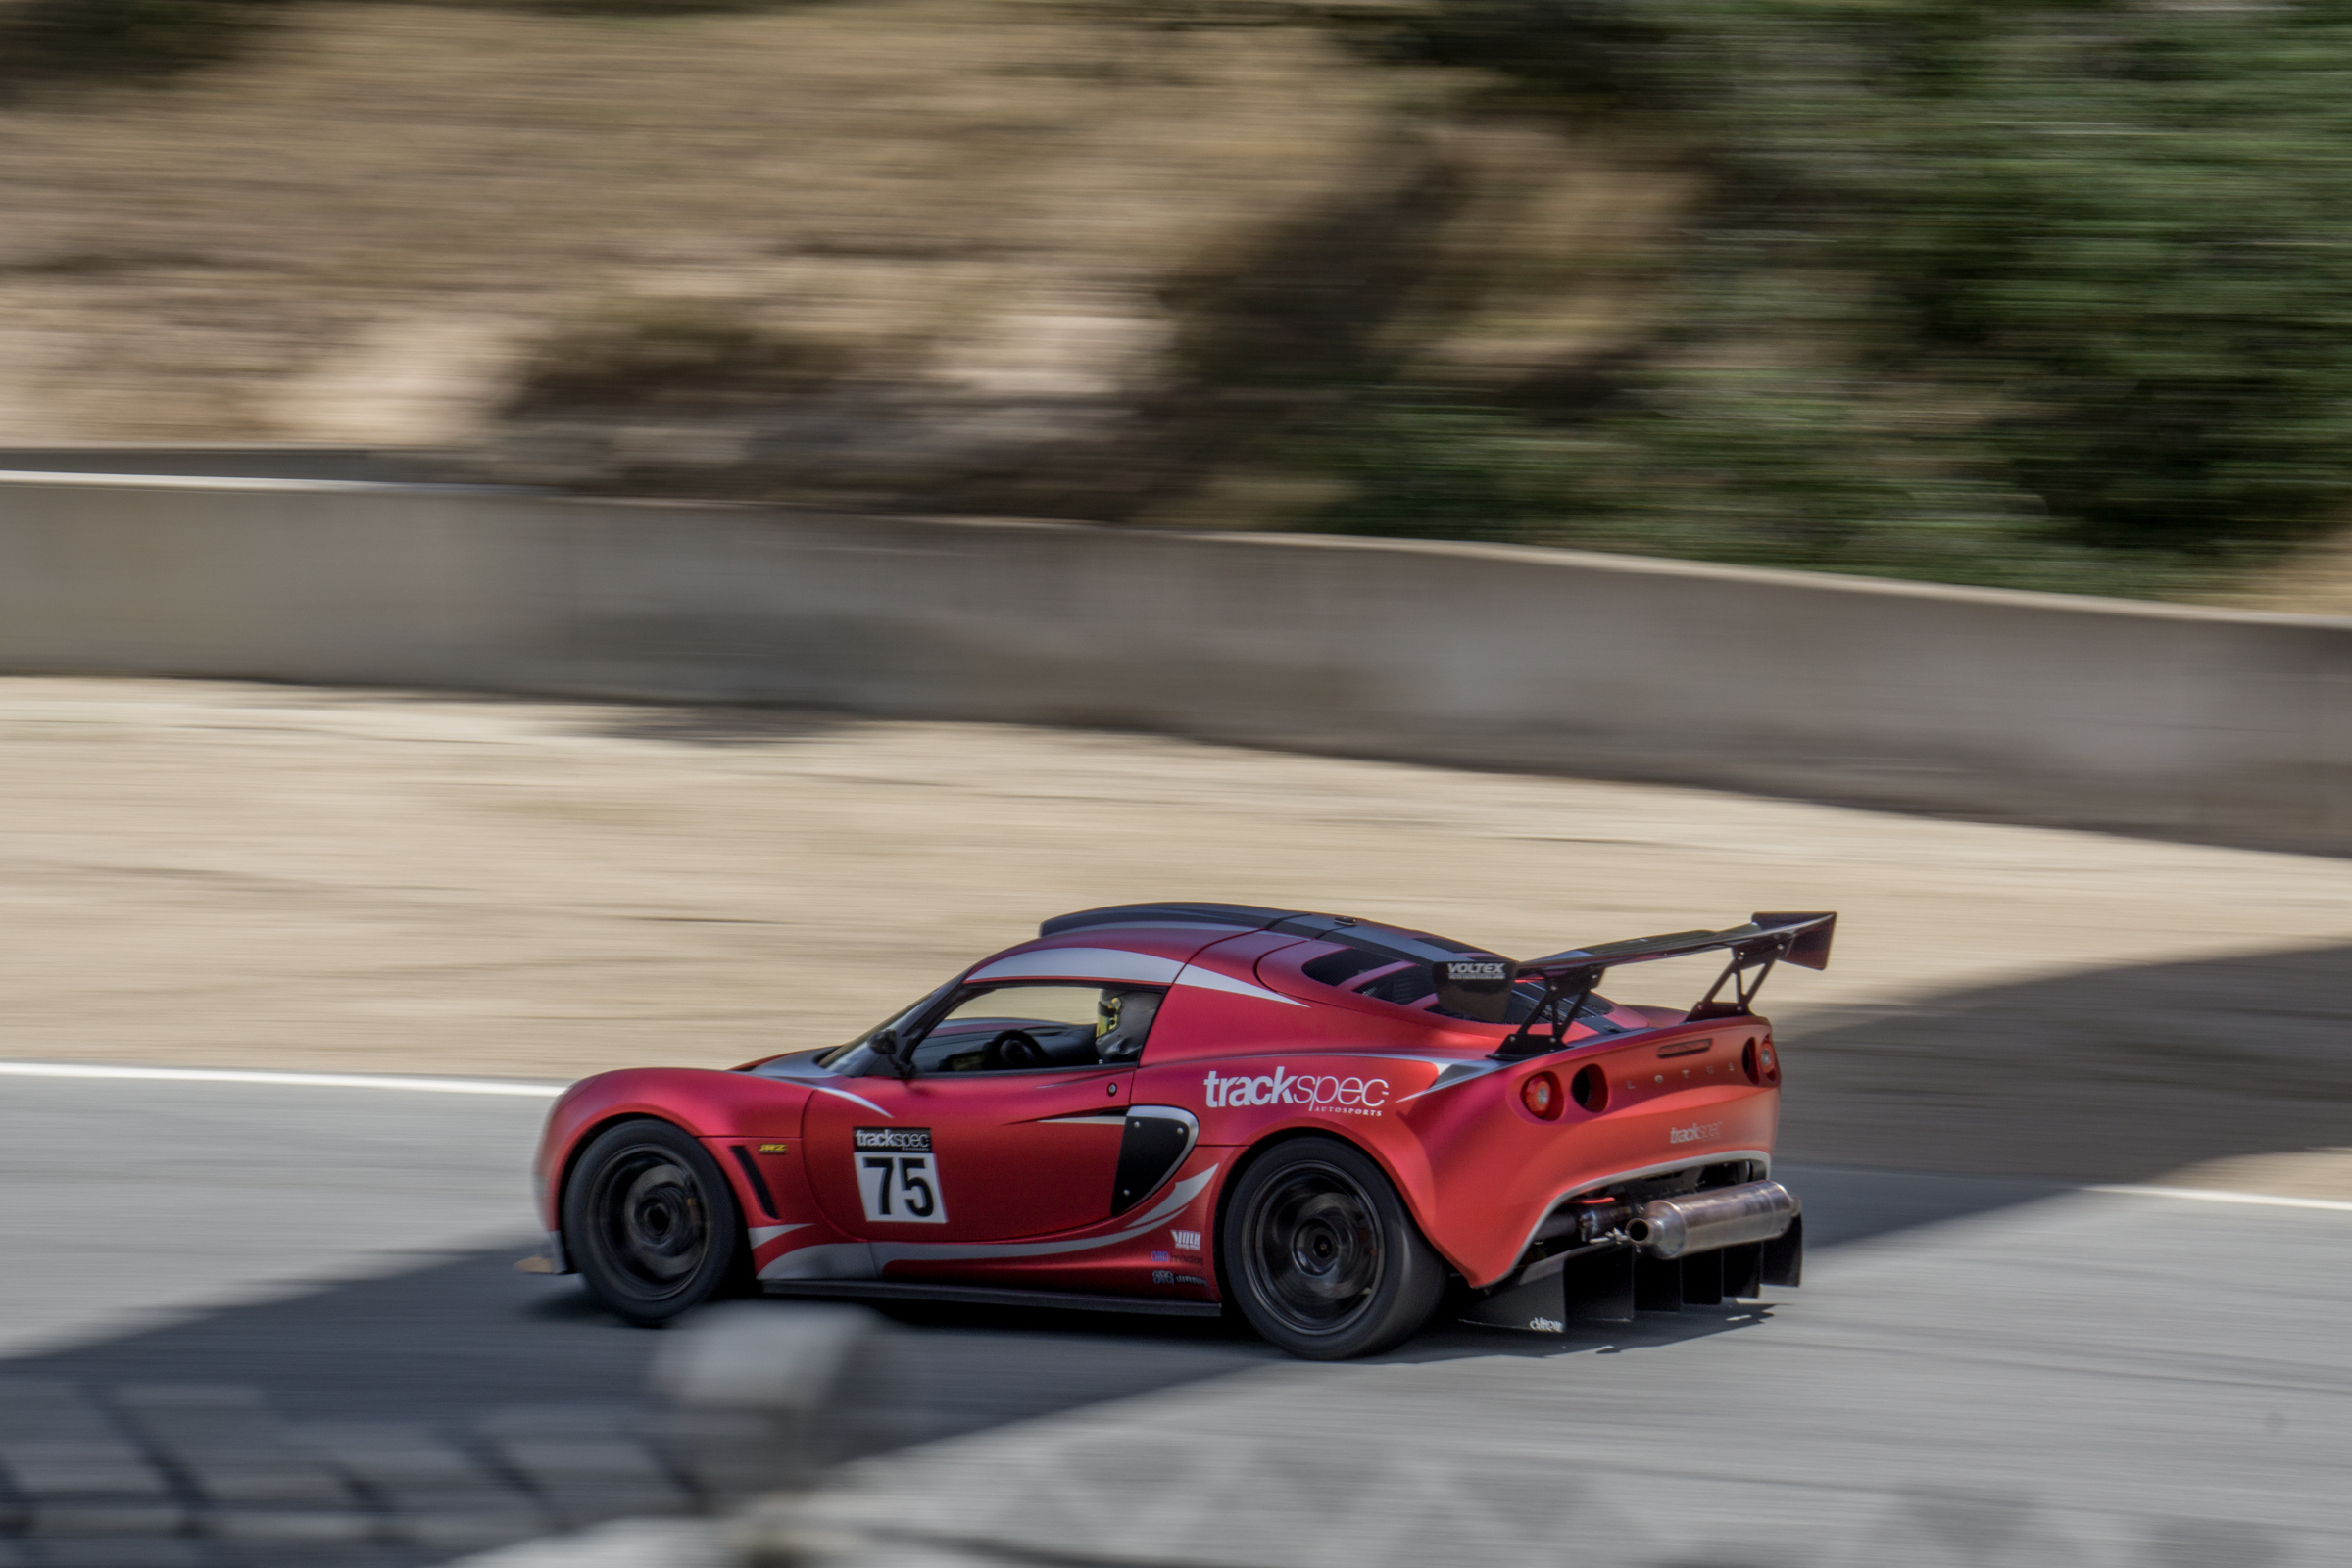 Trackspec Autosports Laguna Seca Golden Gate Lotus Club GGLC Lotus Exige